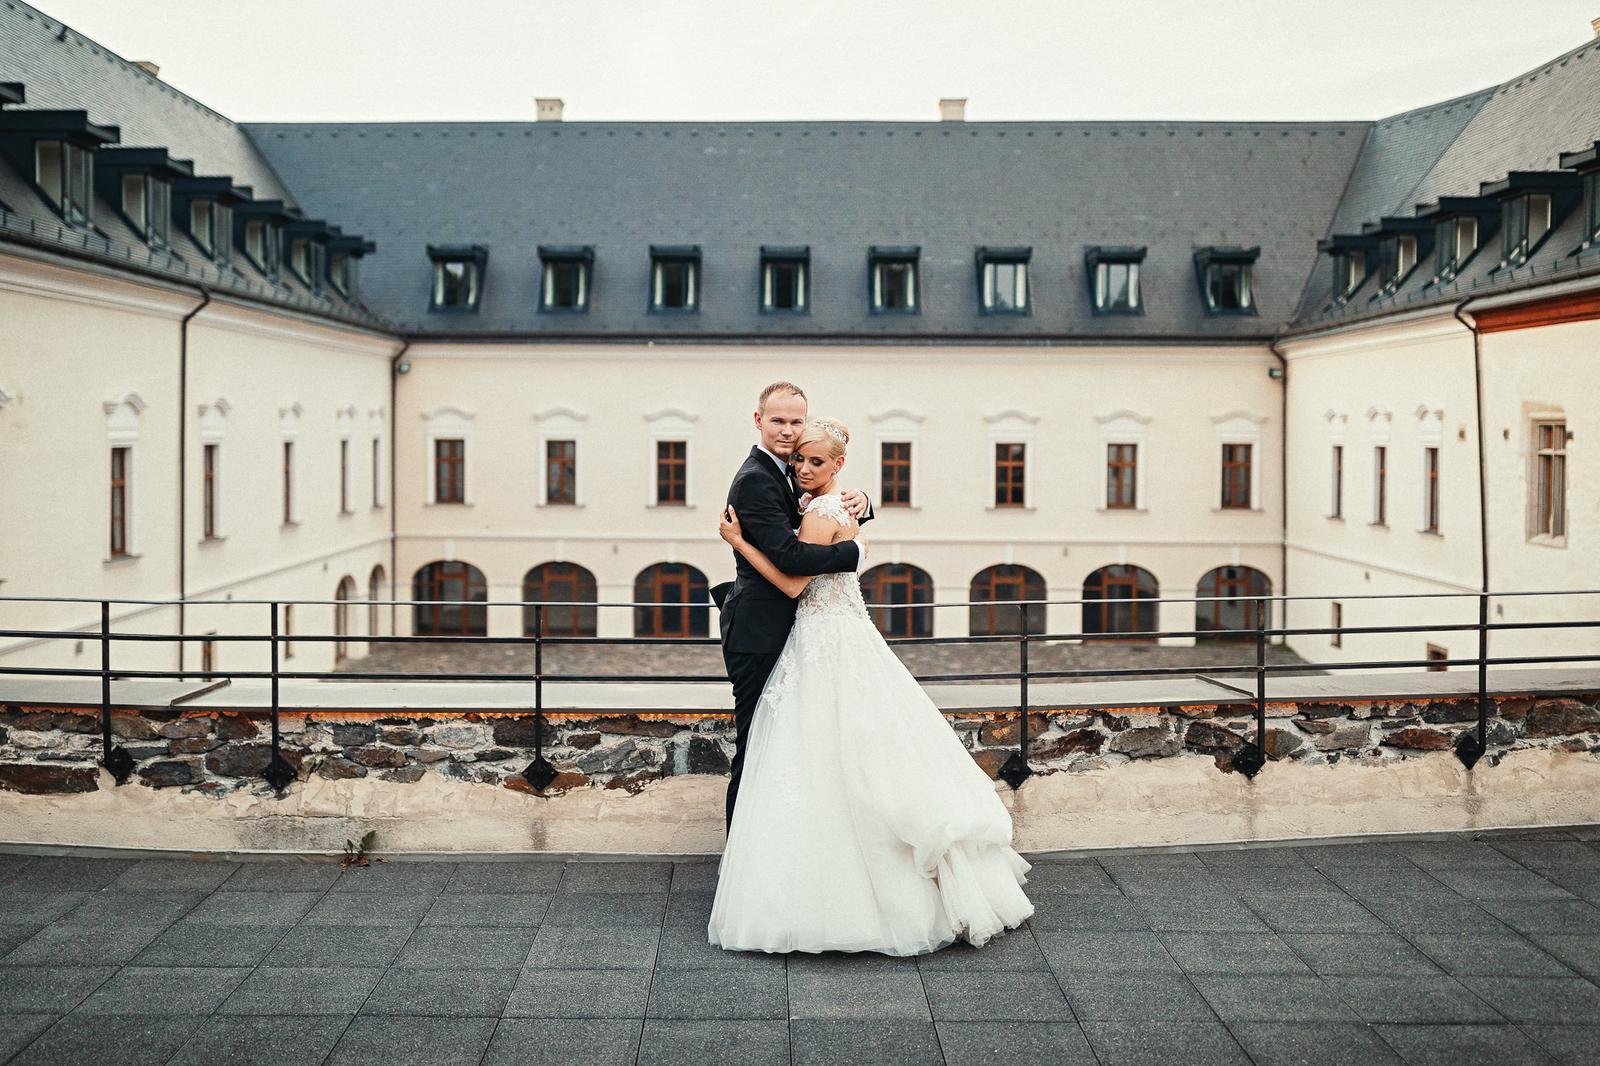 SVADBY 2019 - Fotograf: Vlado Veverka